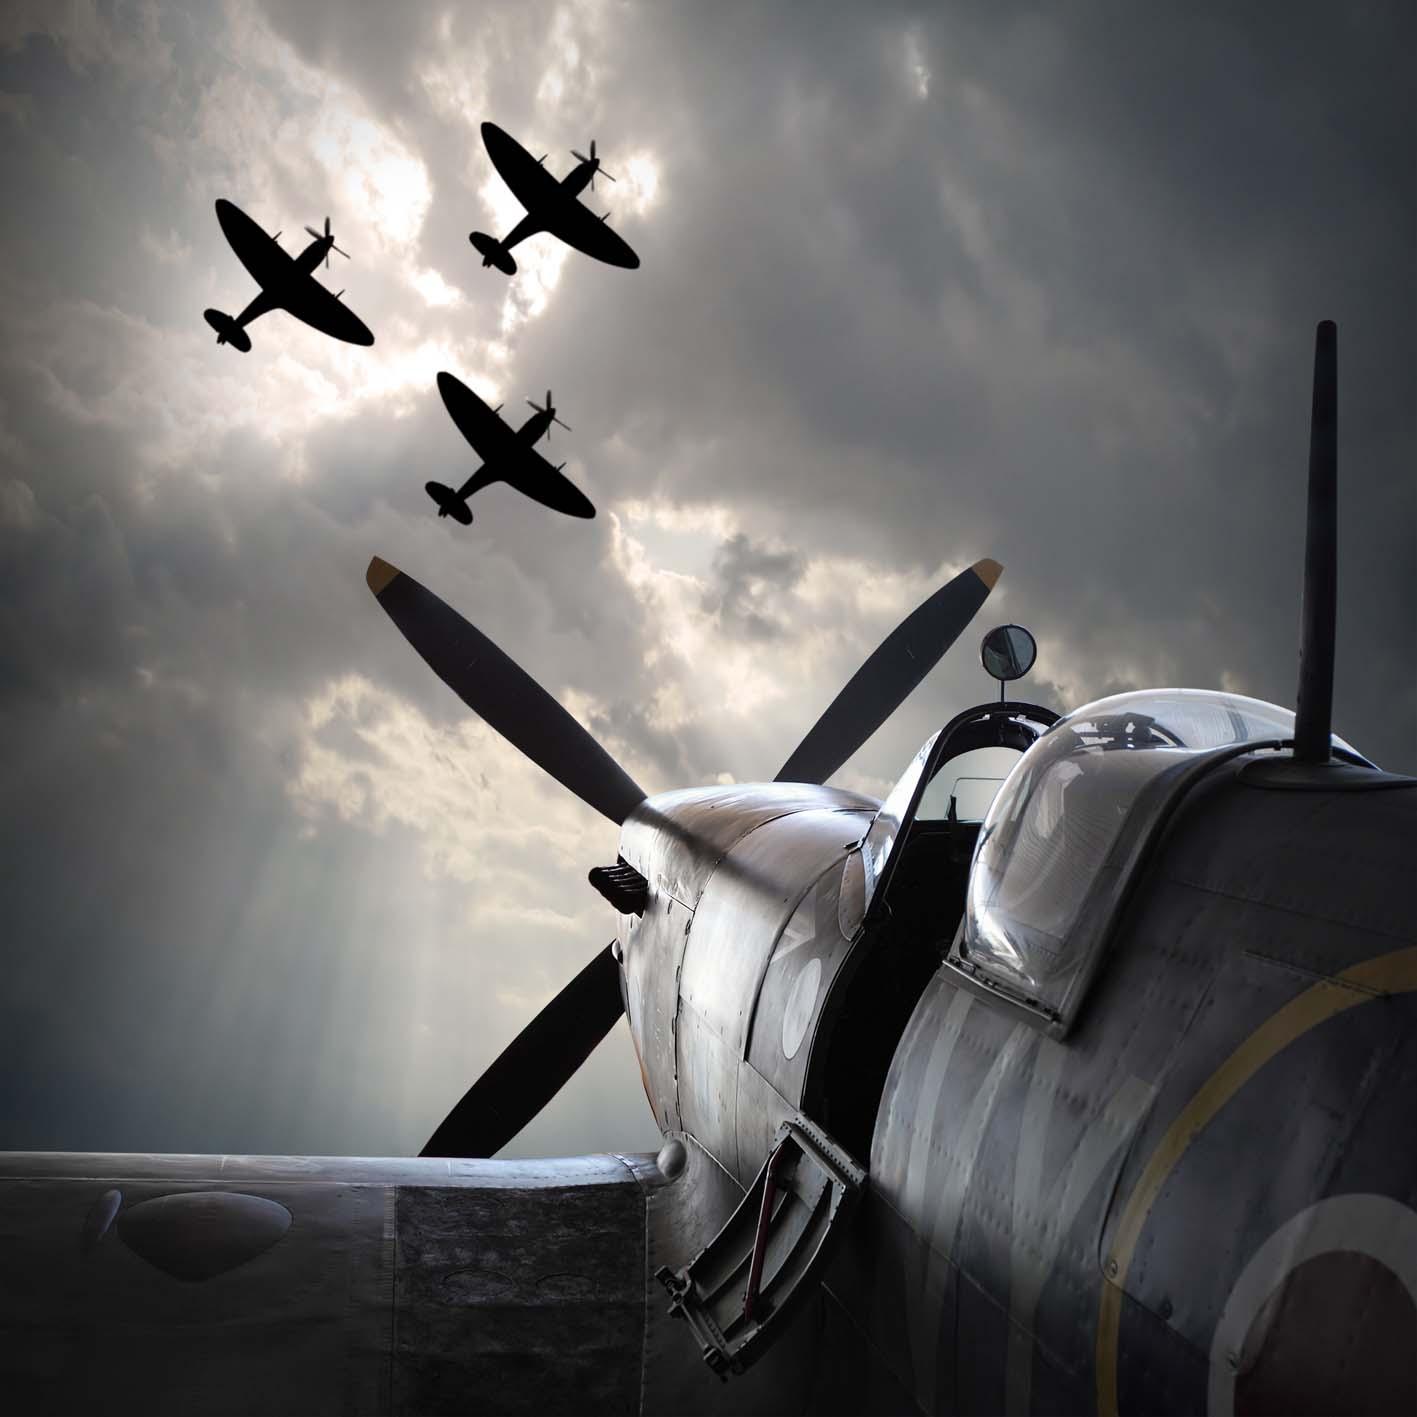 World War II planes